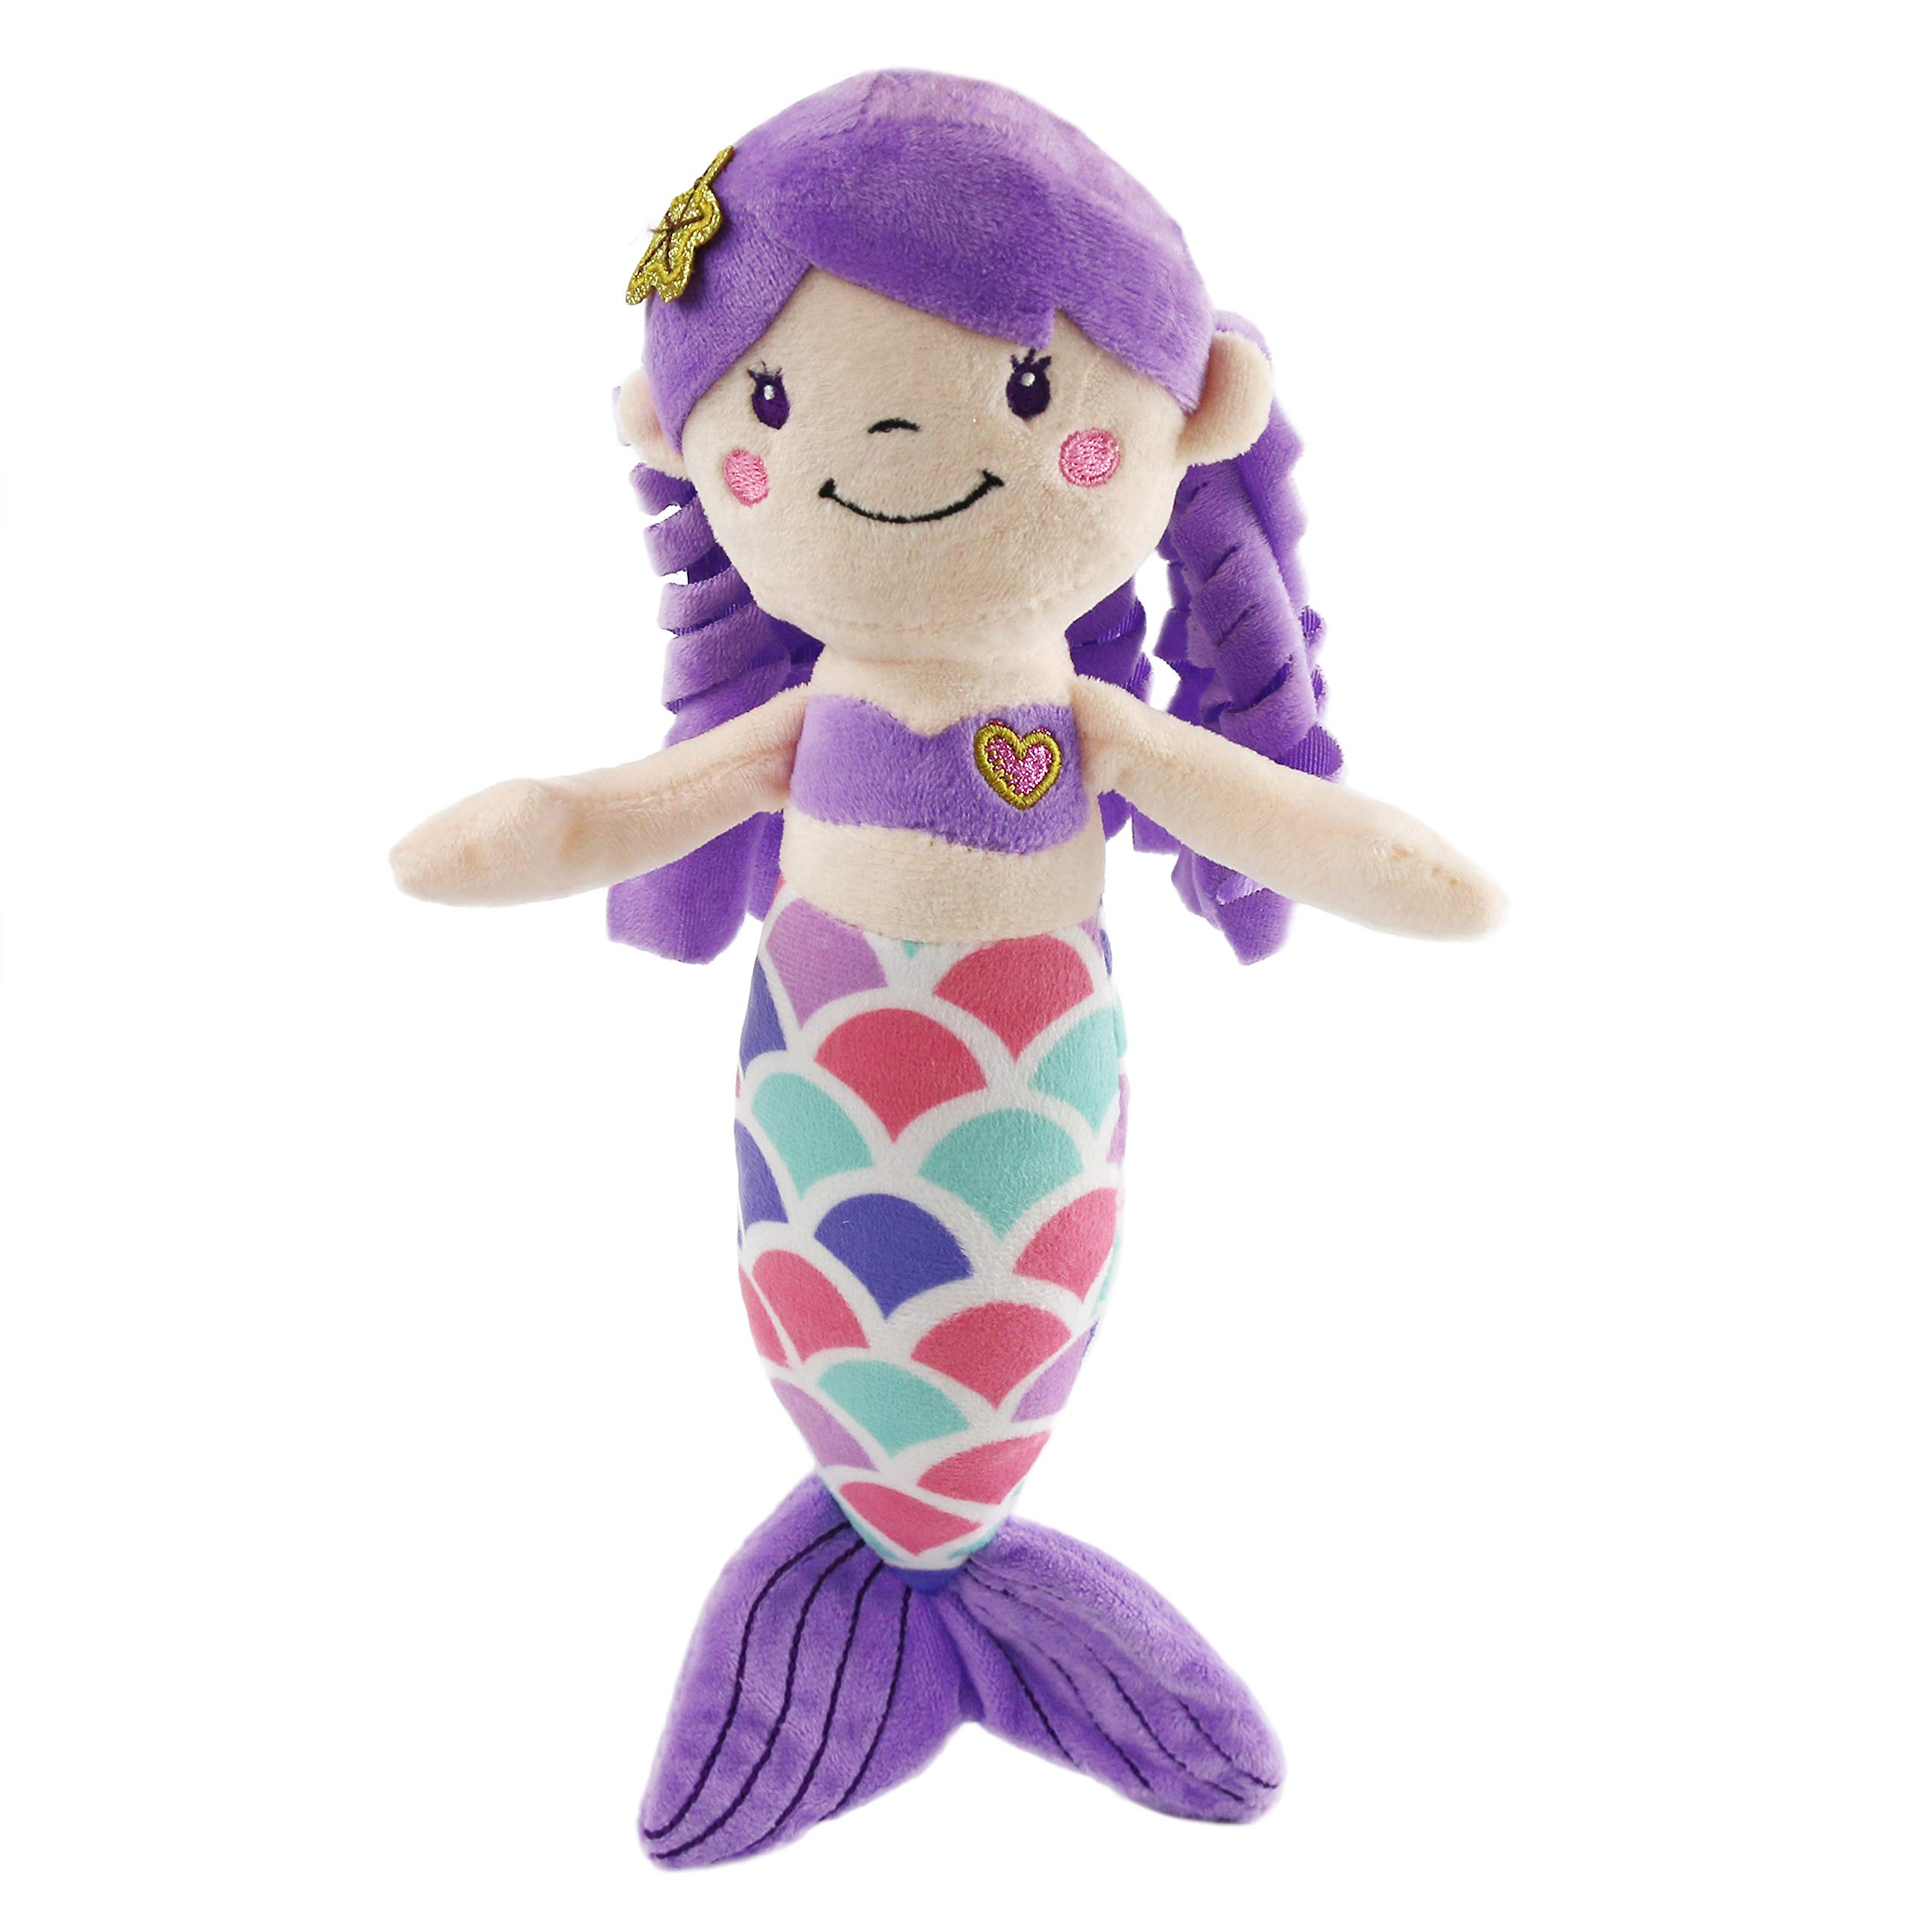 Athoinsu Mermaid Princess Stuffed Animals Soft Plush Toys Doll Birthday Children's Day for Toddler Girls, 12'' (Purple)